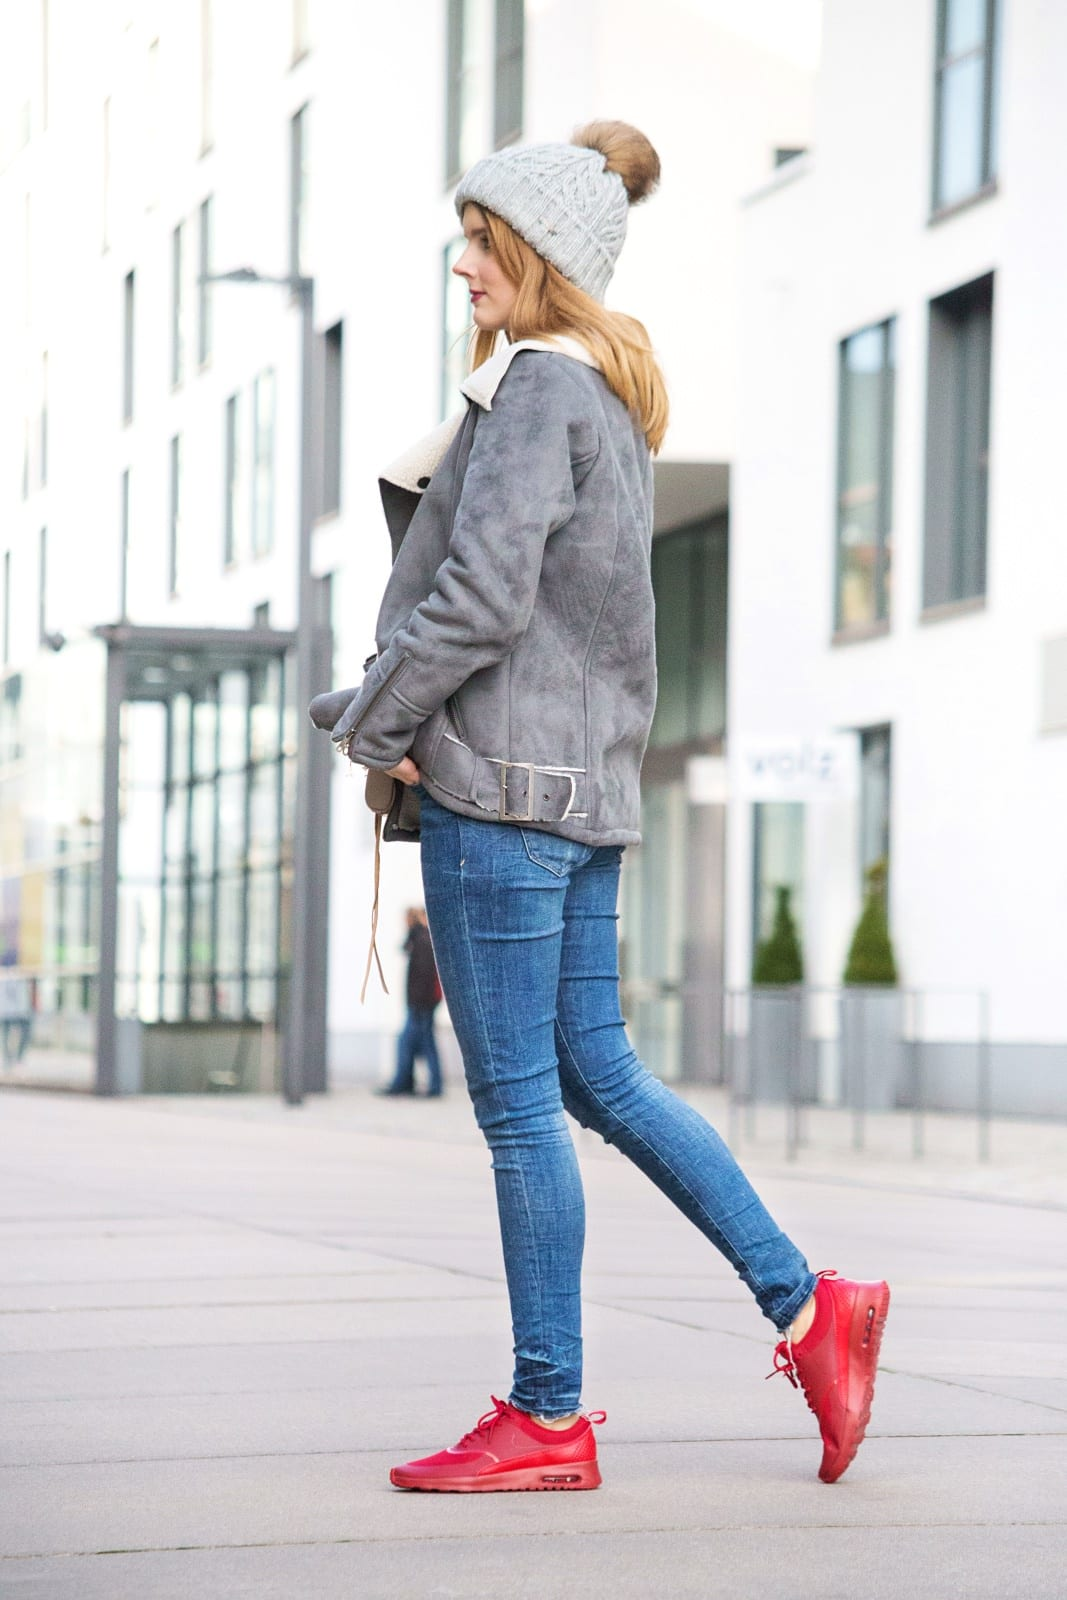 desbelleschoses-outfit-mit-nike-air-max-thea-rote-sneakers-im-fokus-bikerjacke-blue-jeans-mütze 7